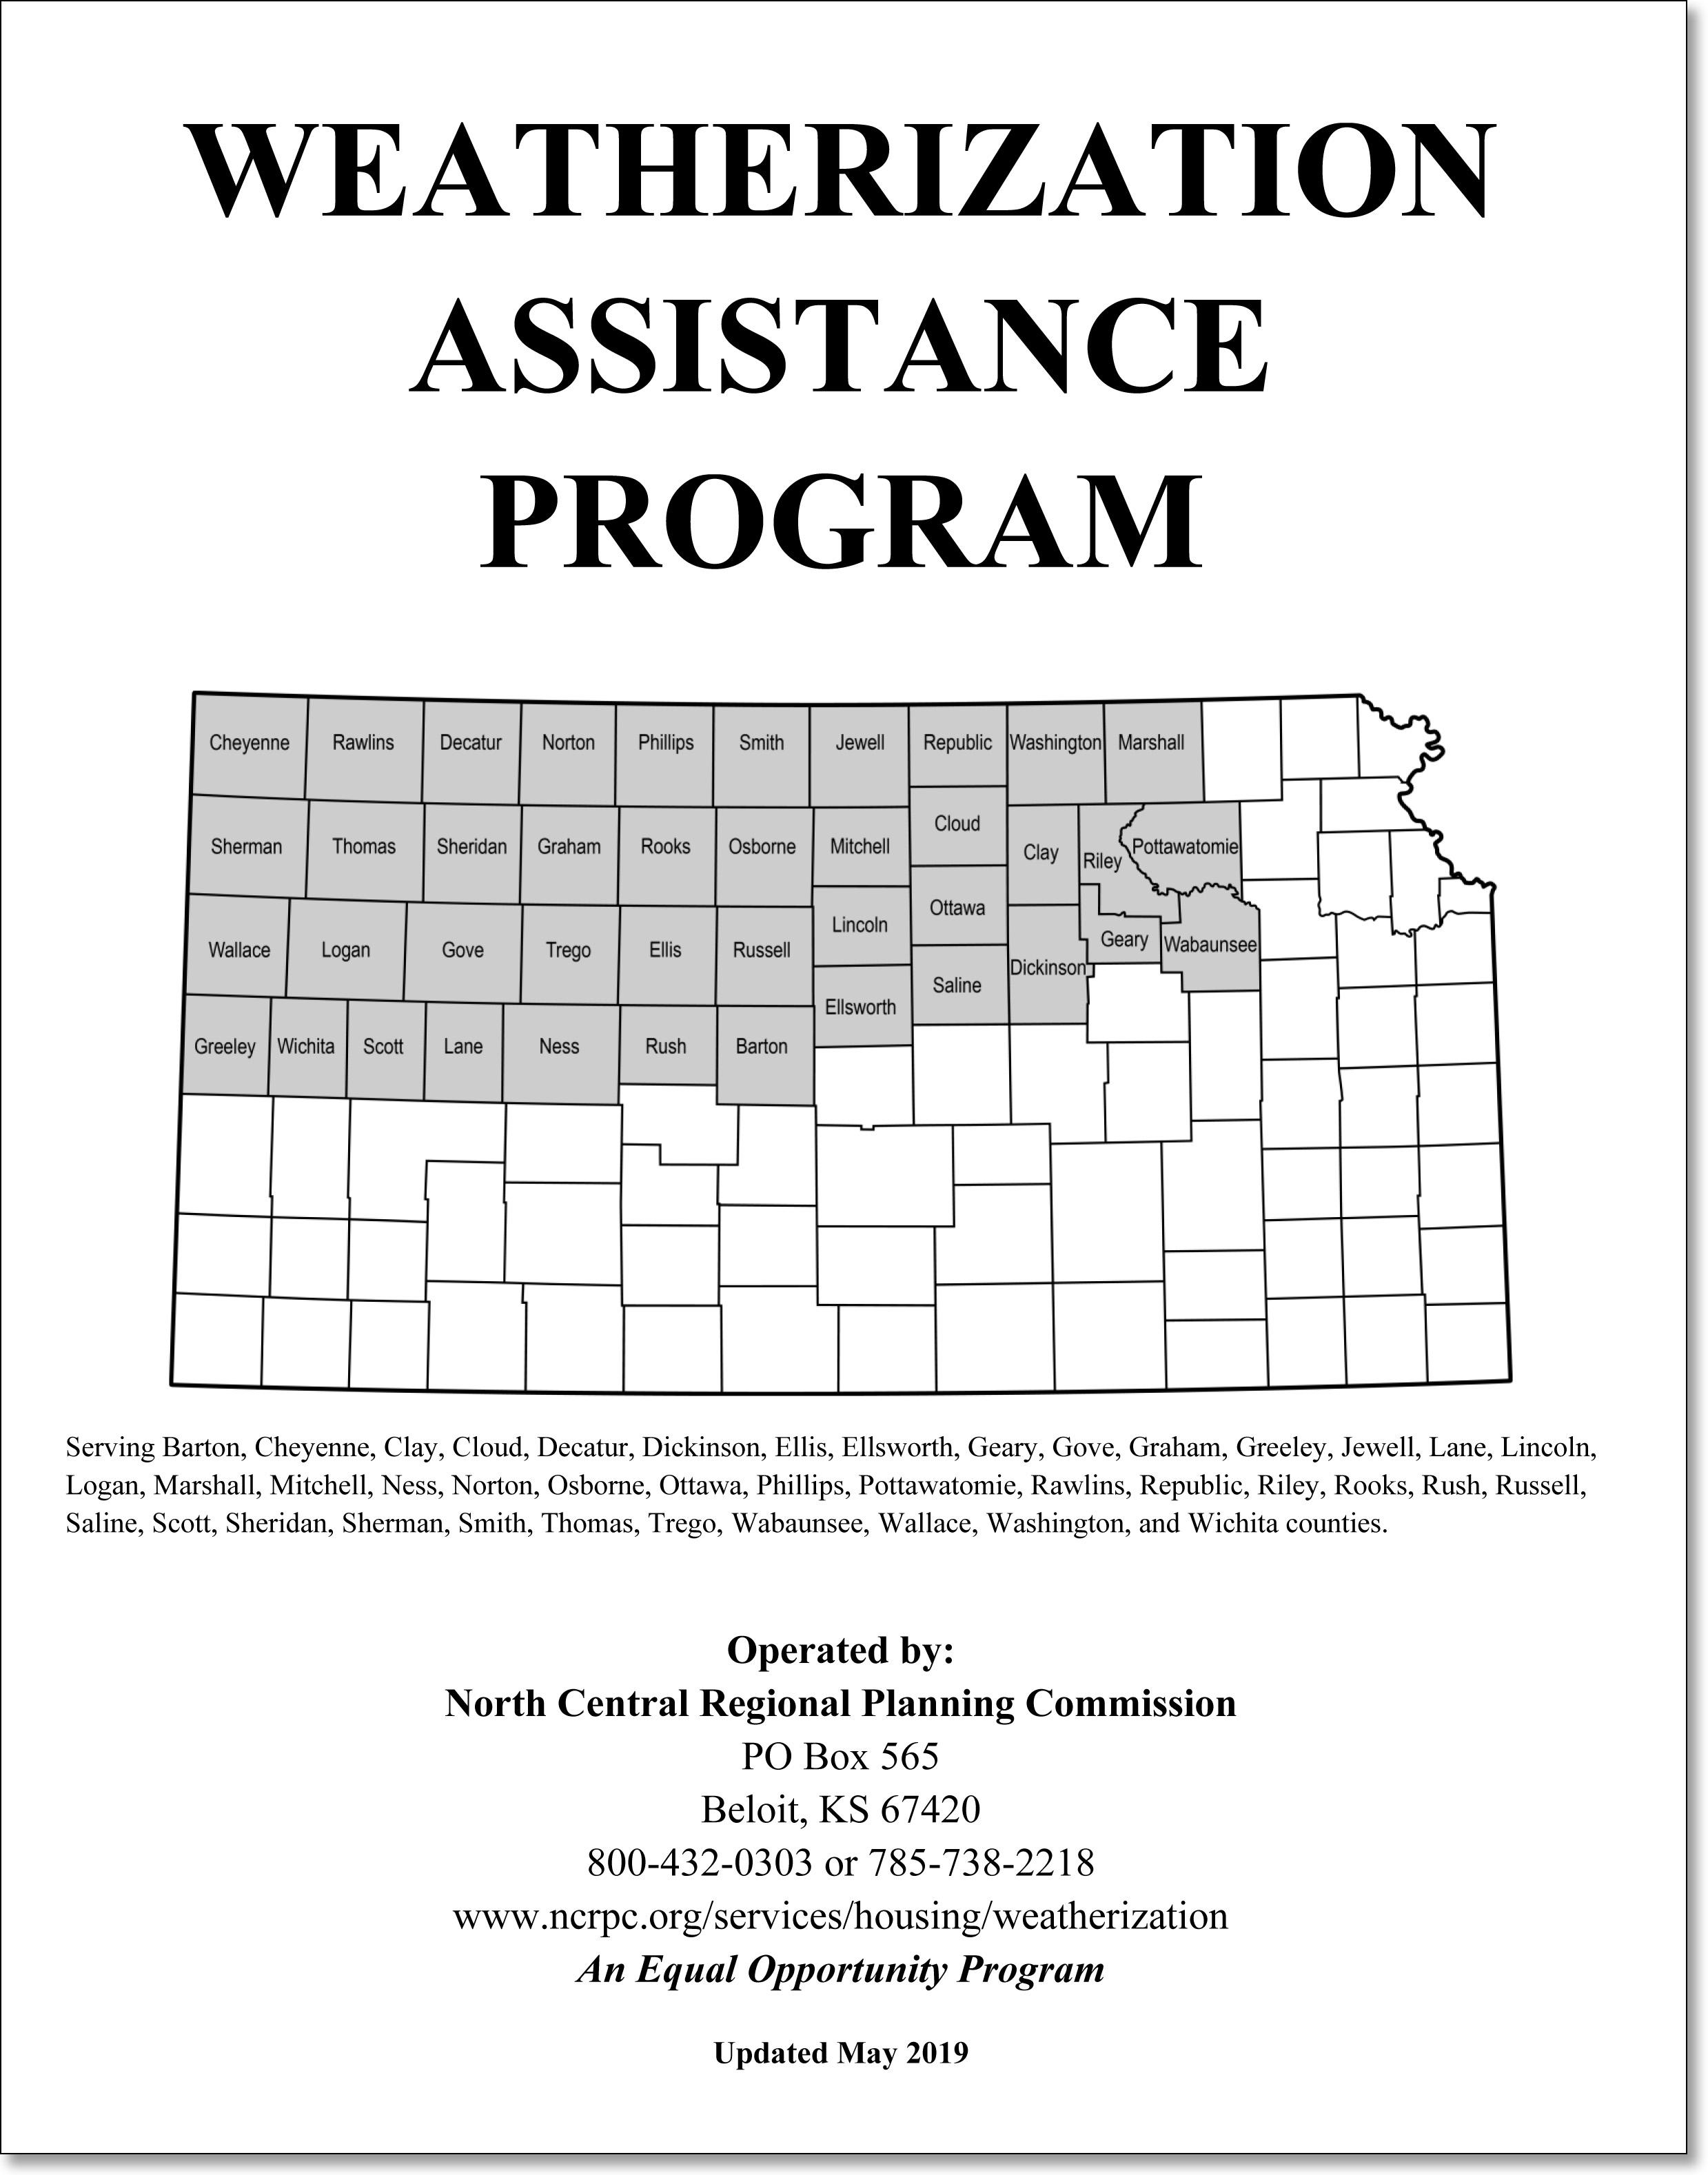 Link to Weatherization Assistance Program Application